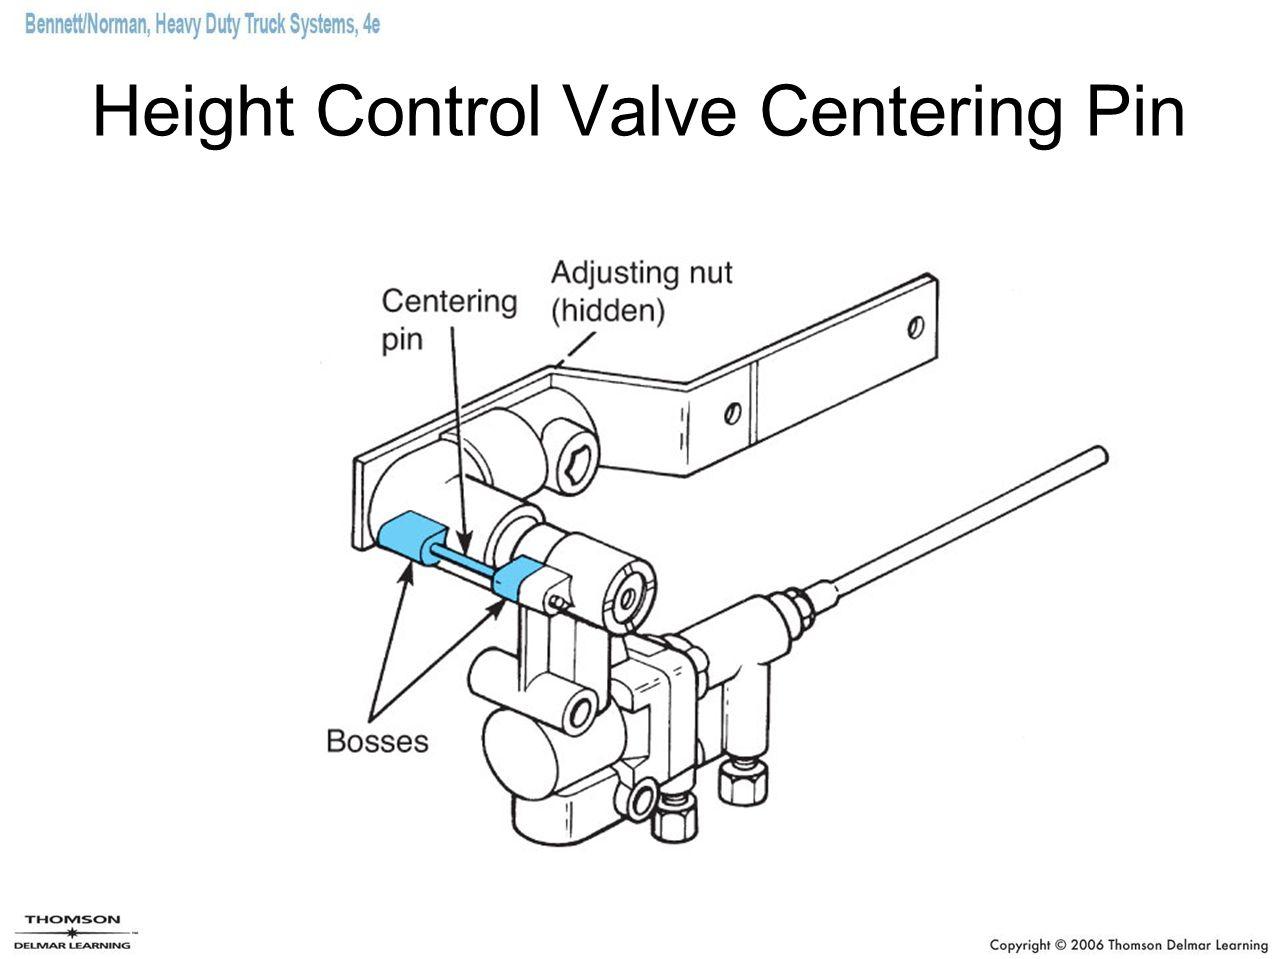 Height Control Valve Centering Pin